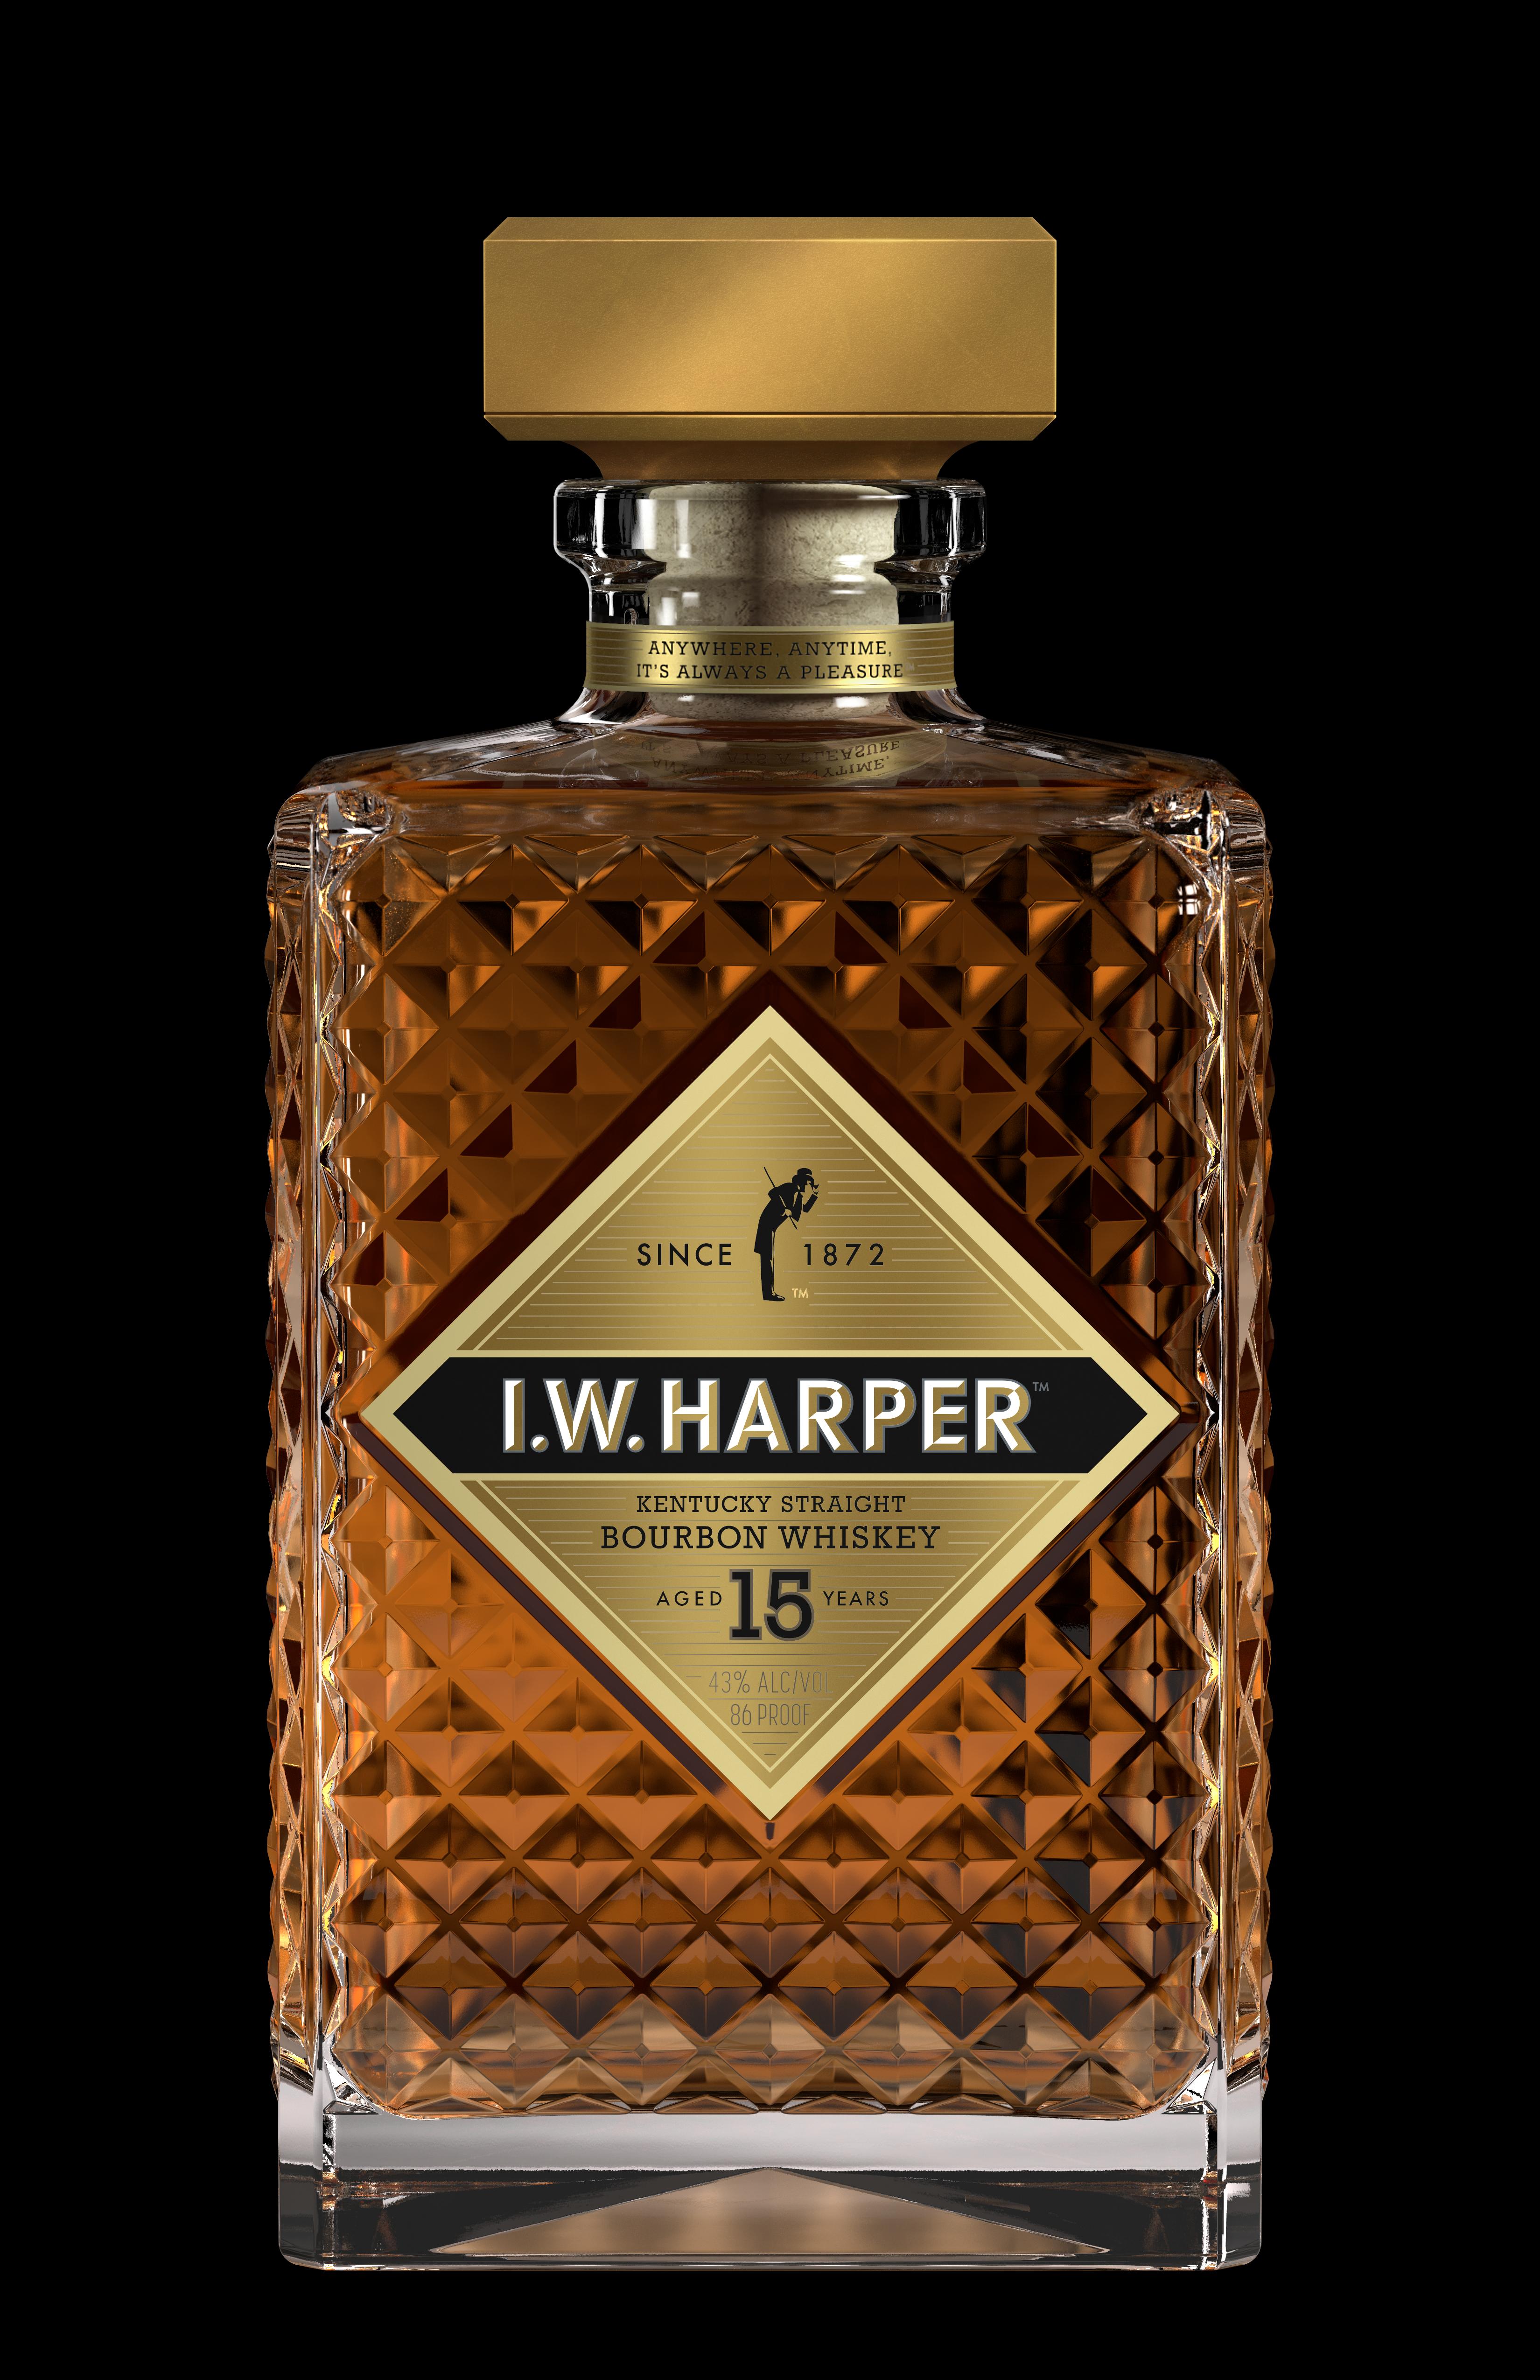 07990a551b3 I.W. Harper 15 Year Old Kentucky Straight Bourbon Whiskey. Photo courtesy  Taylor Strategies I.W.Harper